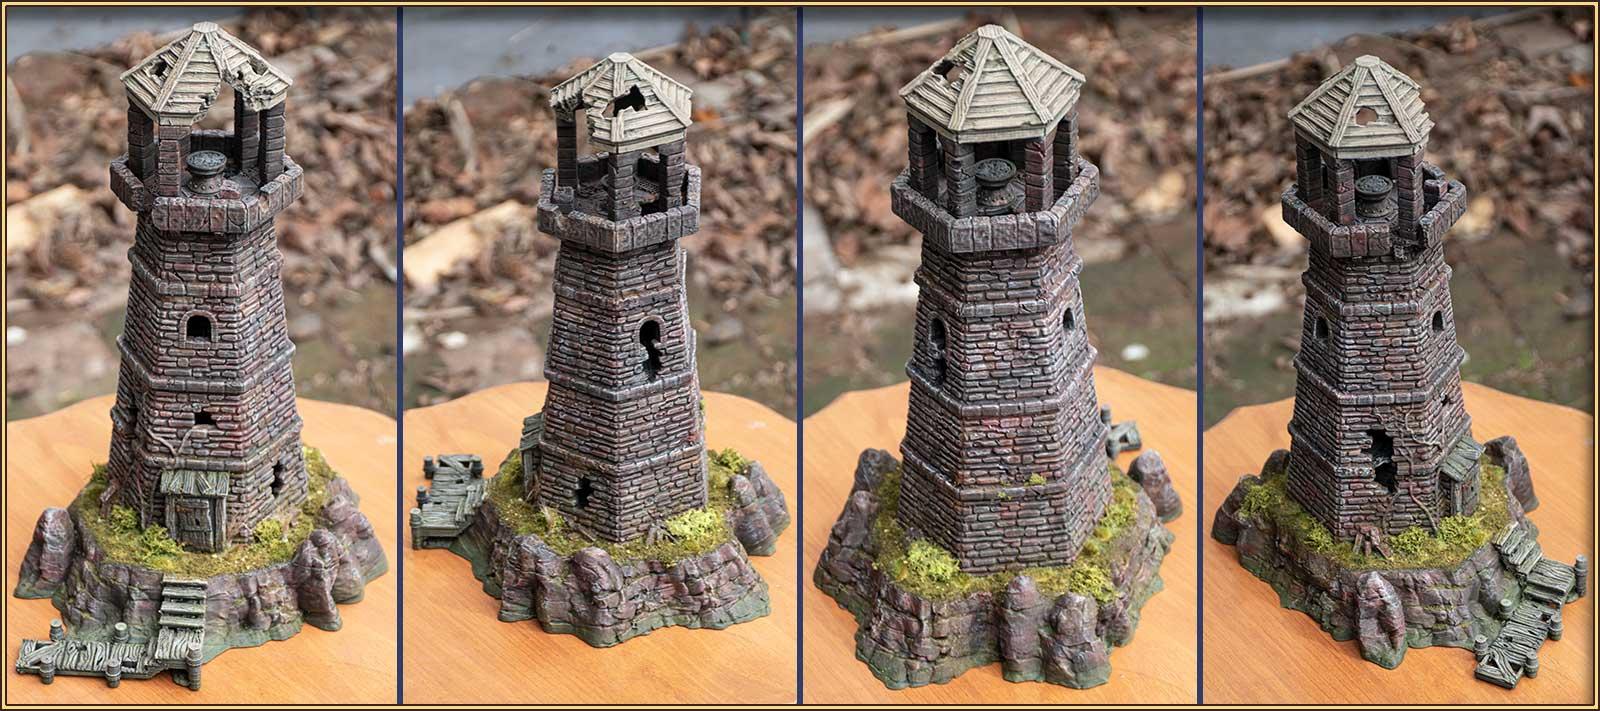 2021-09-10-Lighthouse.jpg